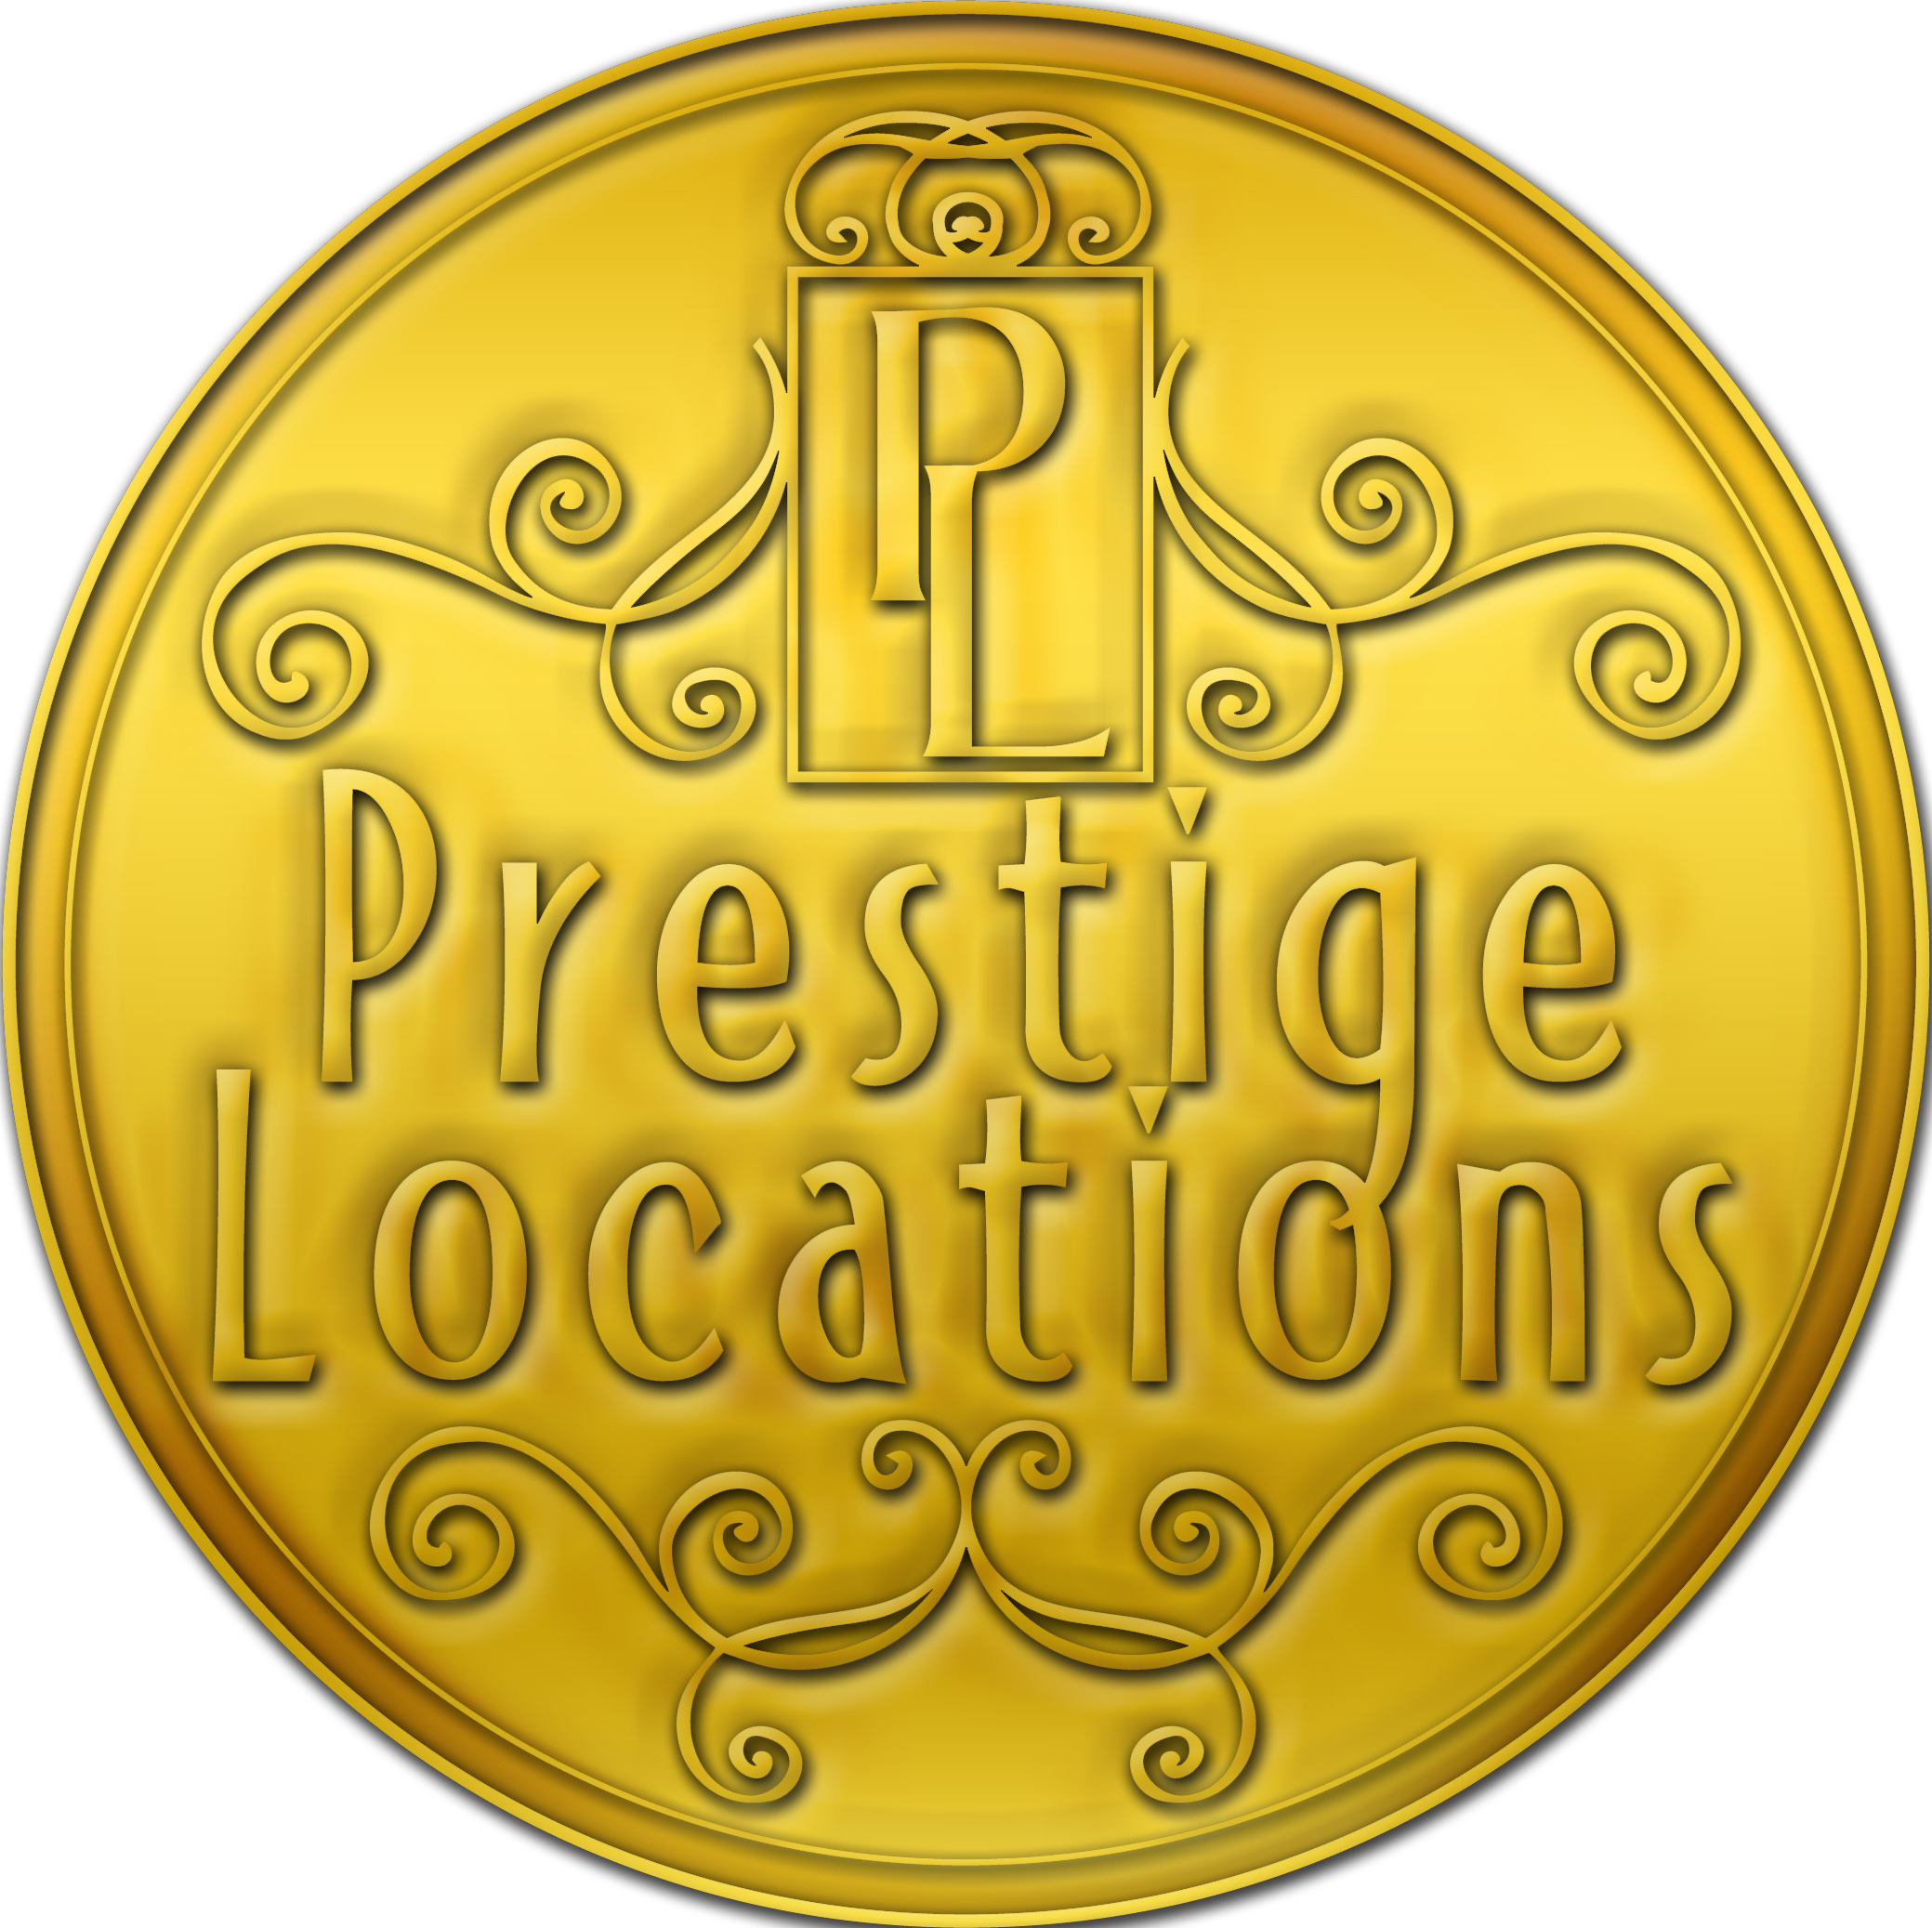 Prestige Locations Guyane